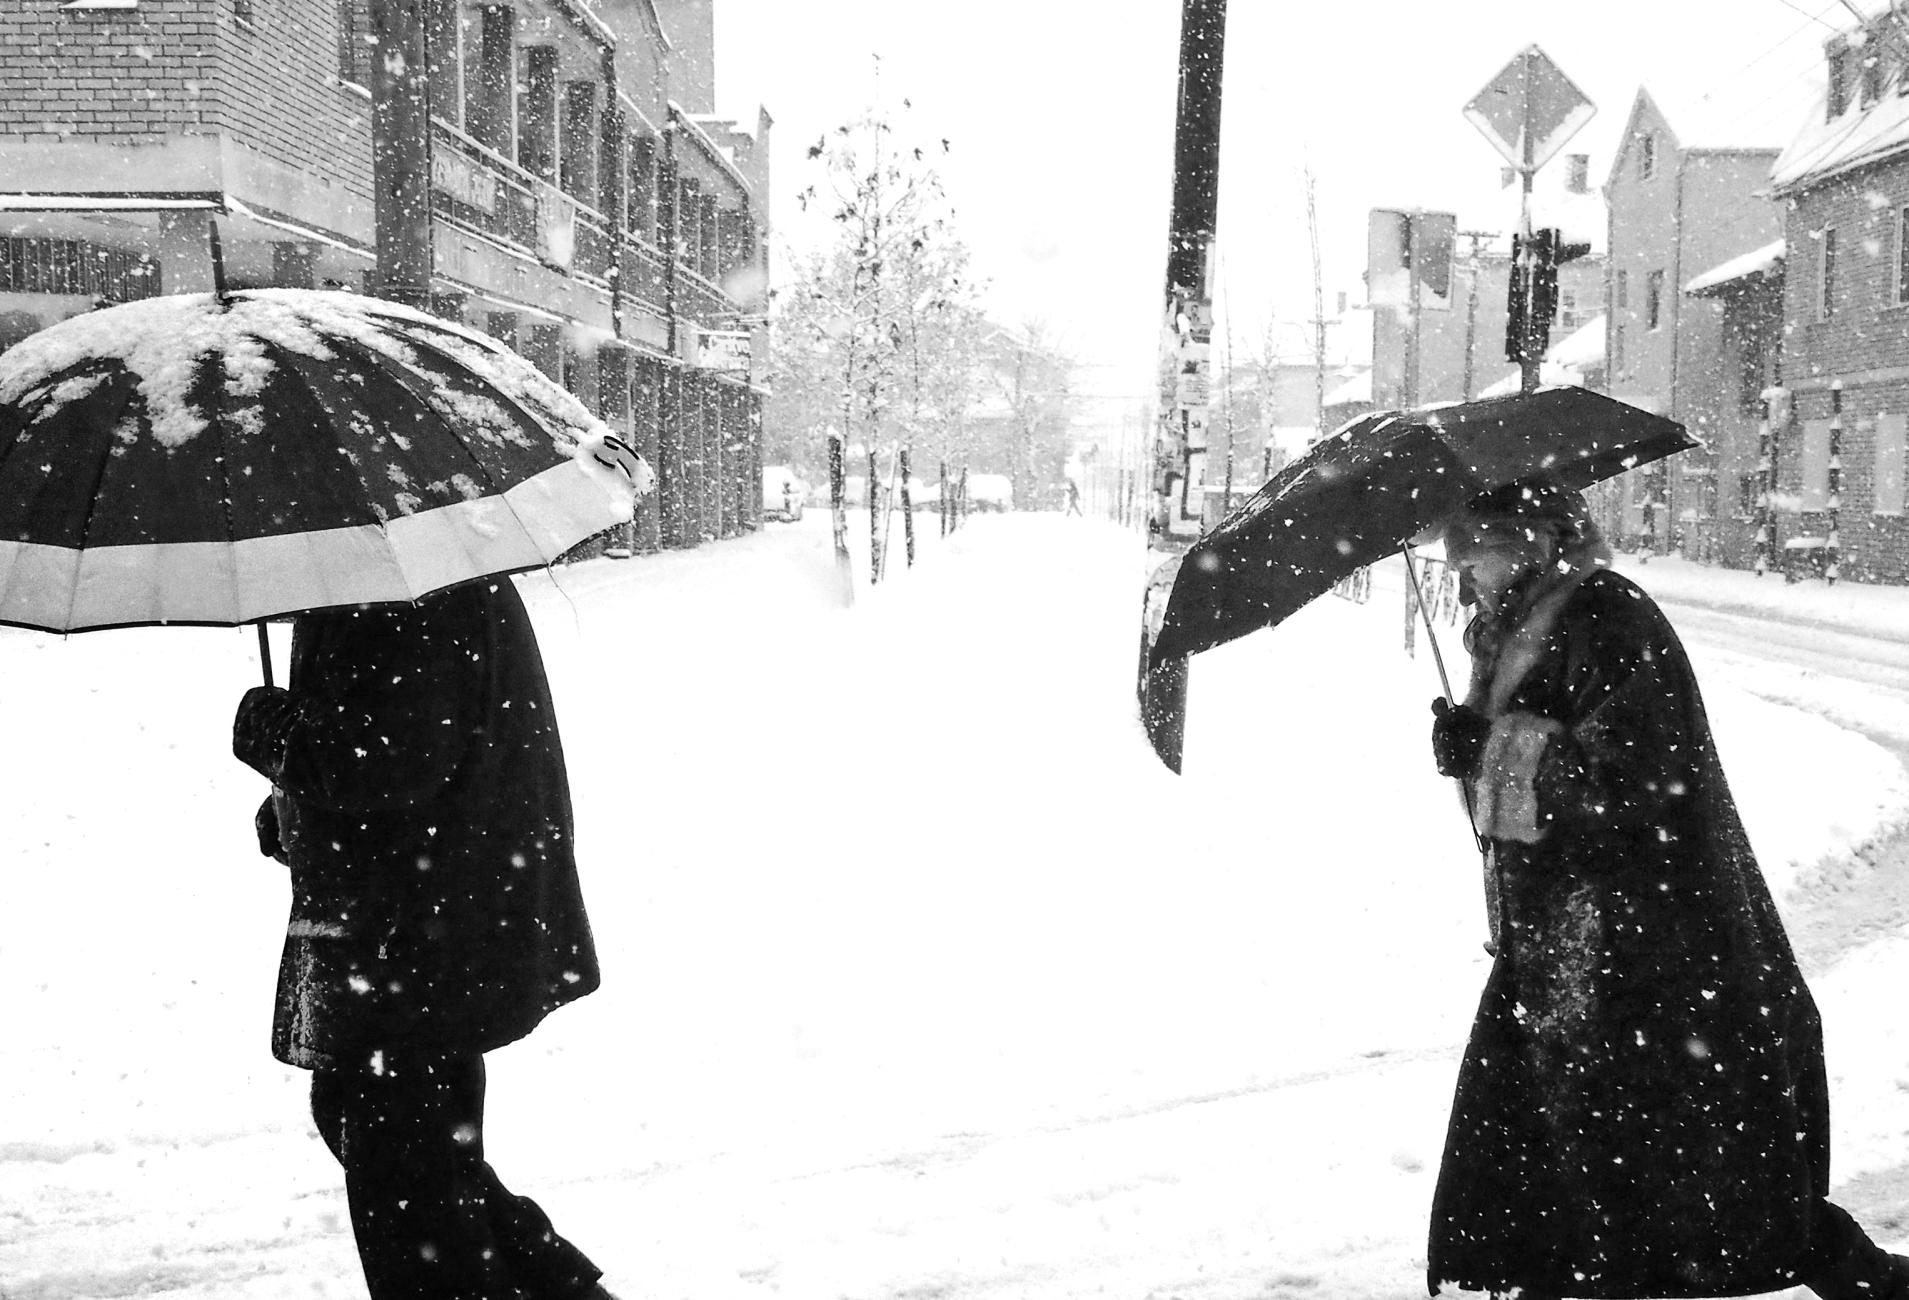 Into the Winter III